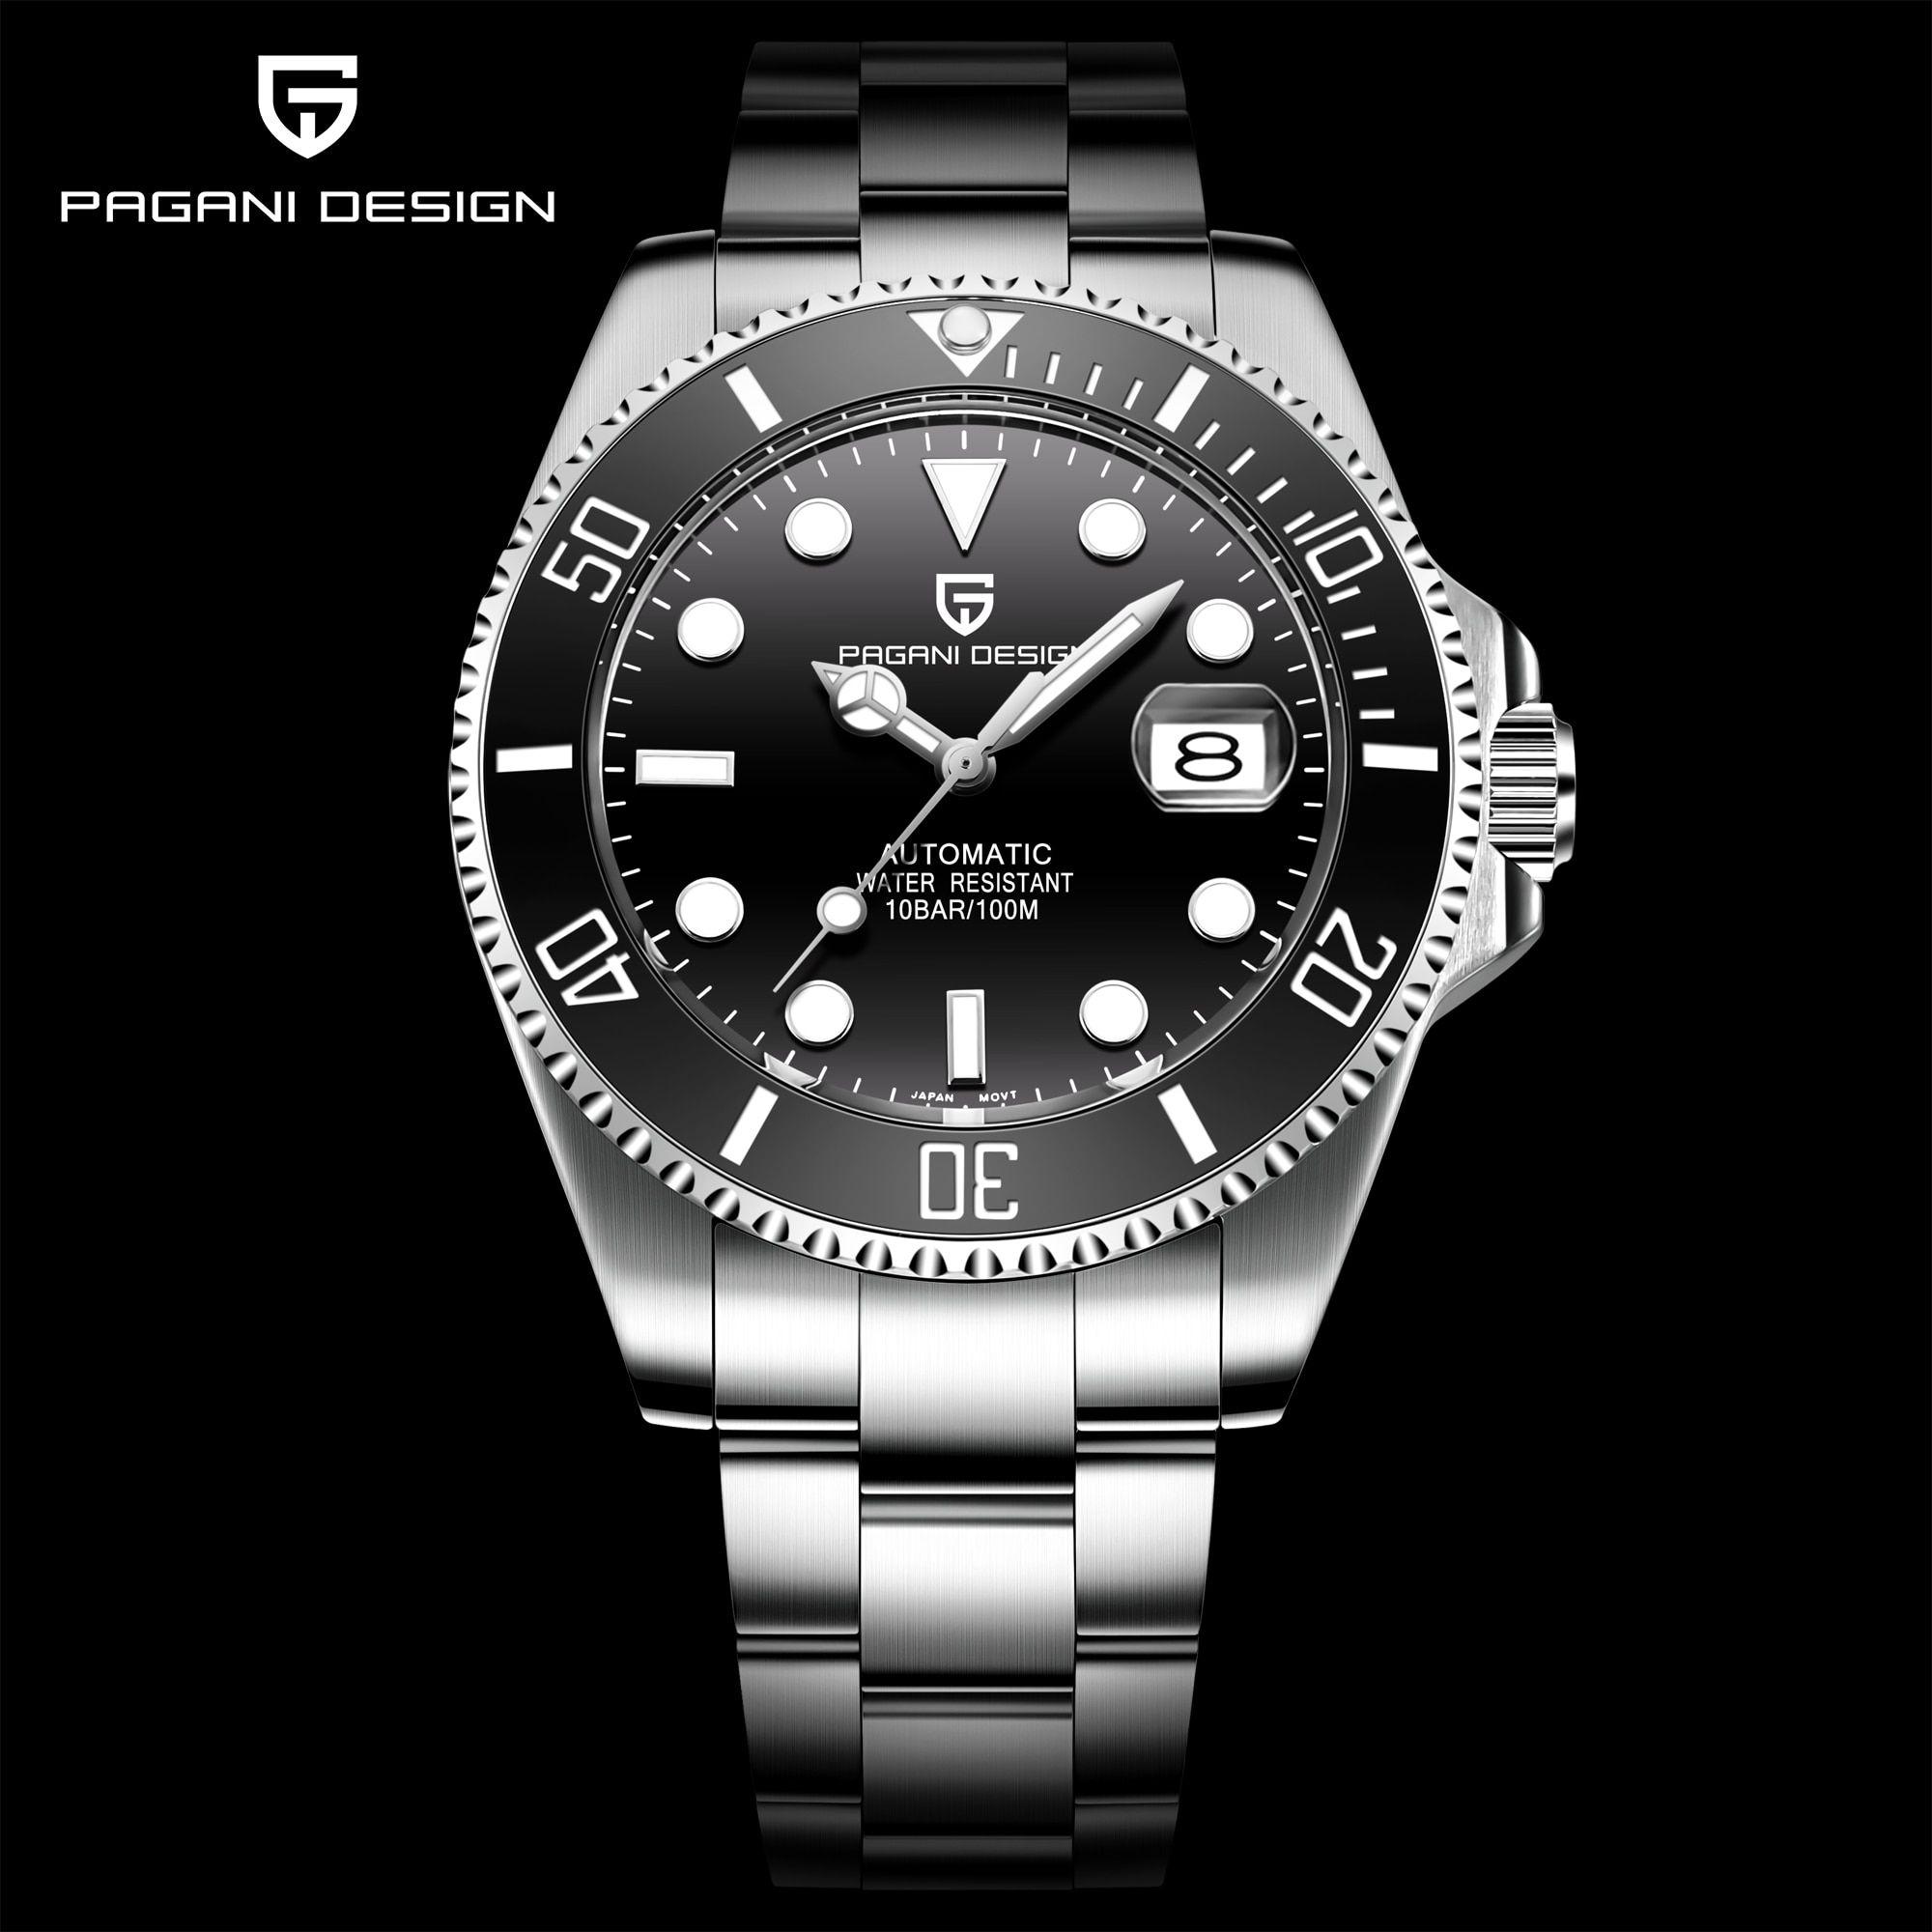 2020 Pagani Design Mechanical Wristwatch Luxury Brand Men Watches Automatic Black Stainless Steel Wa Business Watch Men Watches For Men Business Watch